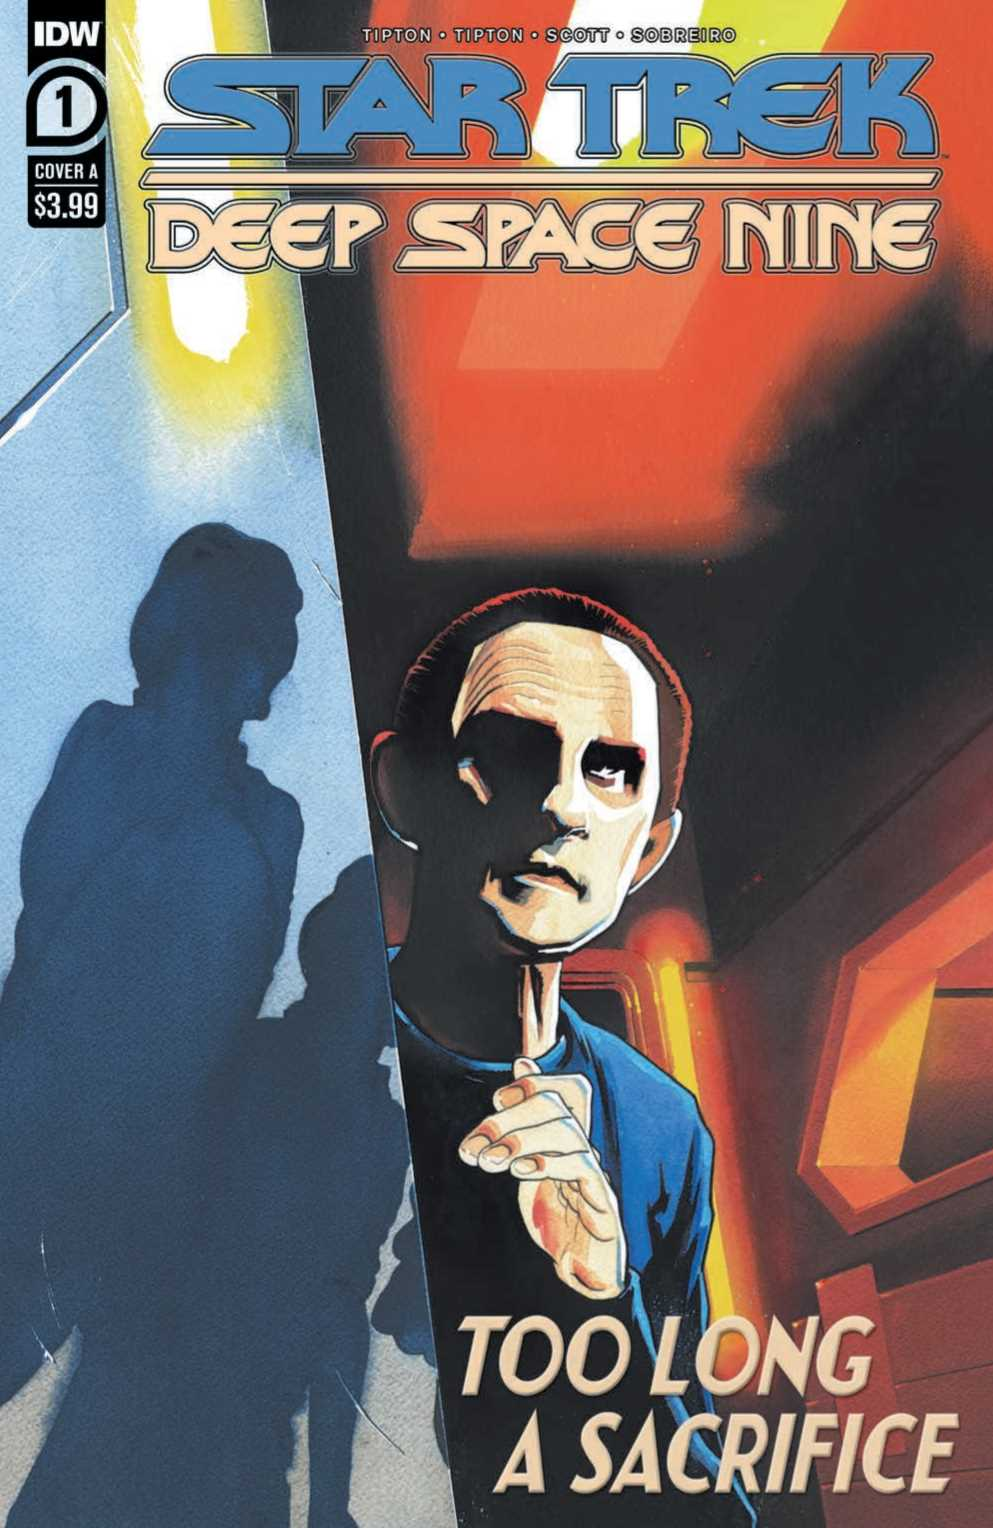 STAR TREK: TOO LONG A SACRIFICE #1 cover by Ricardo Drumond